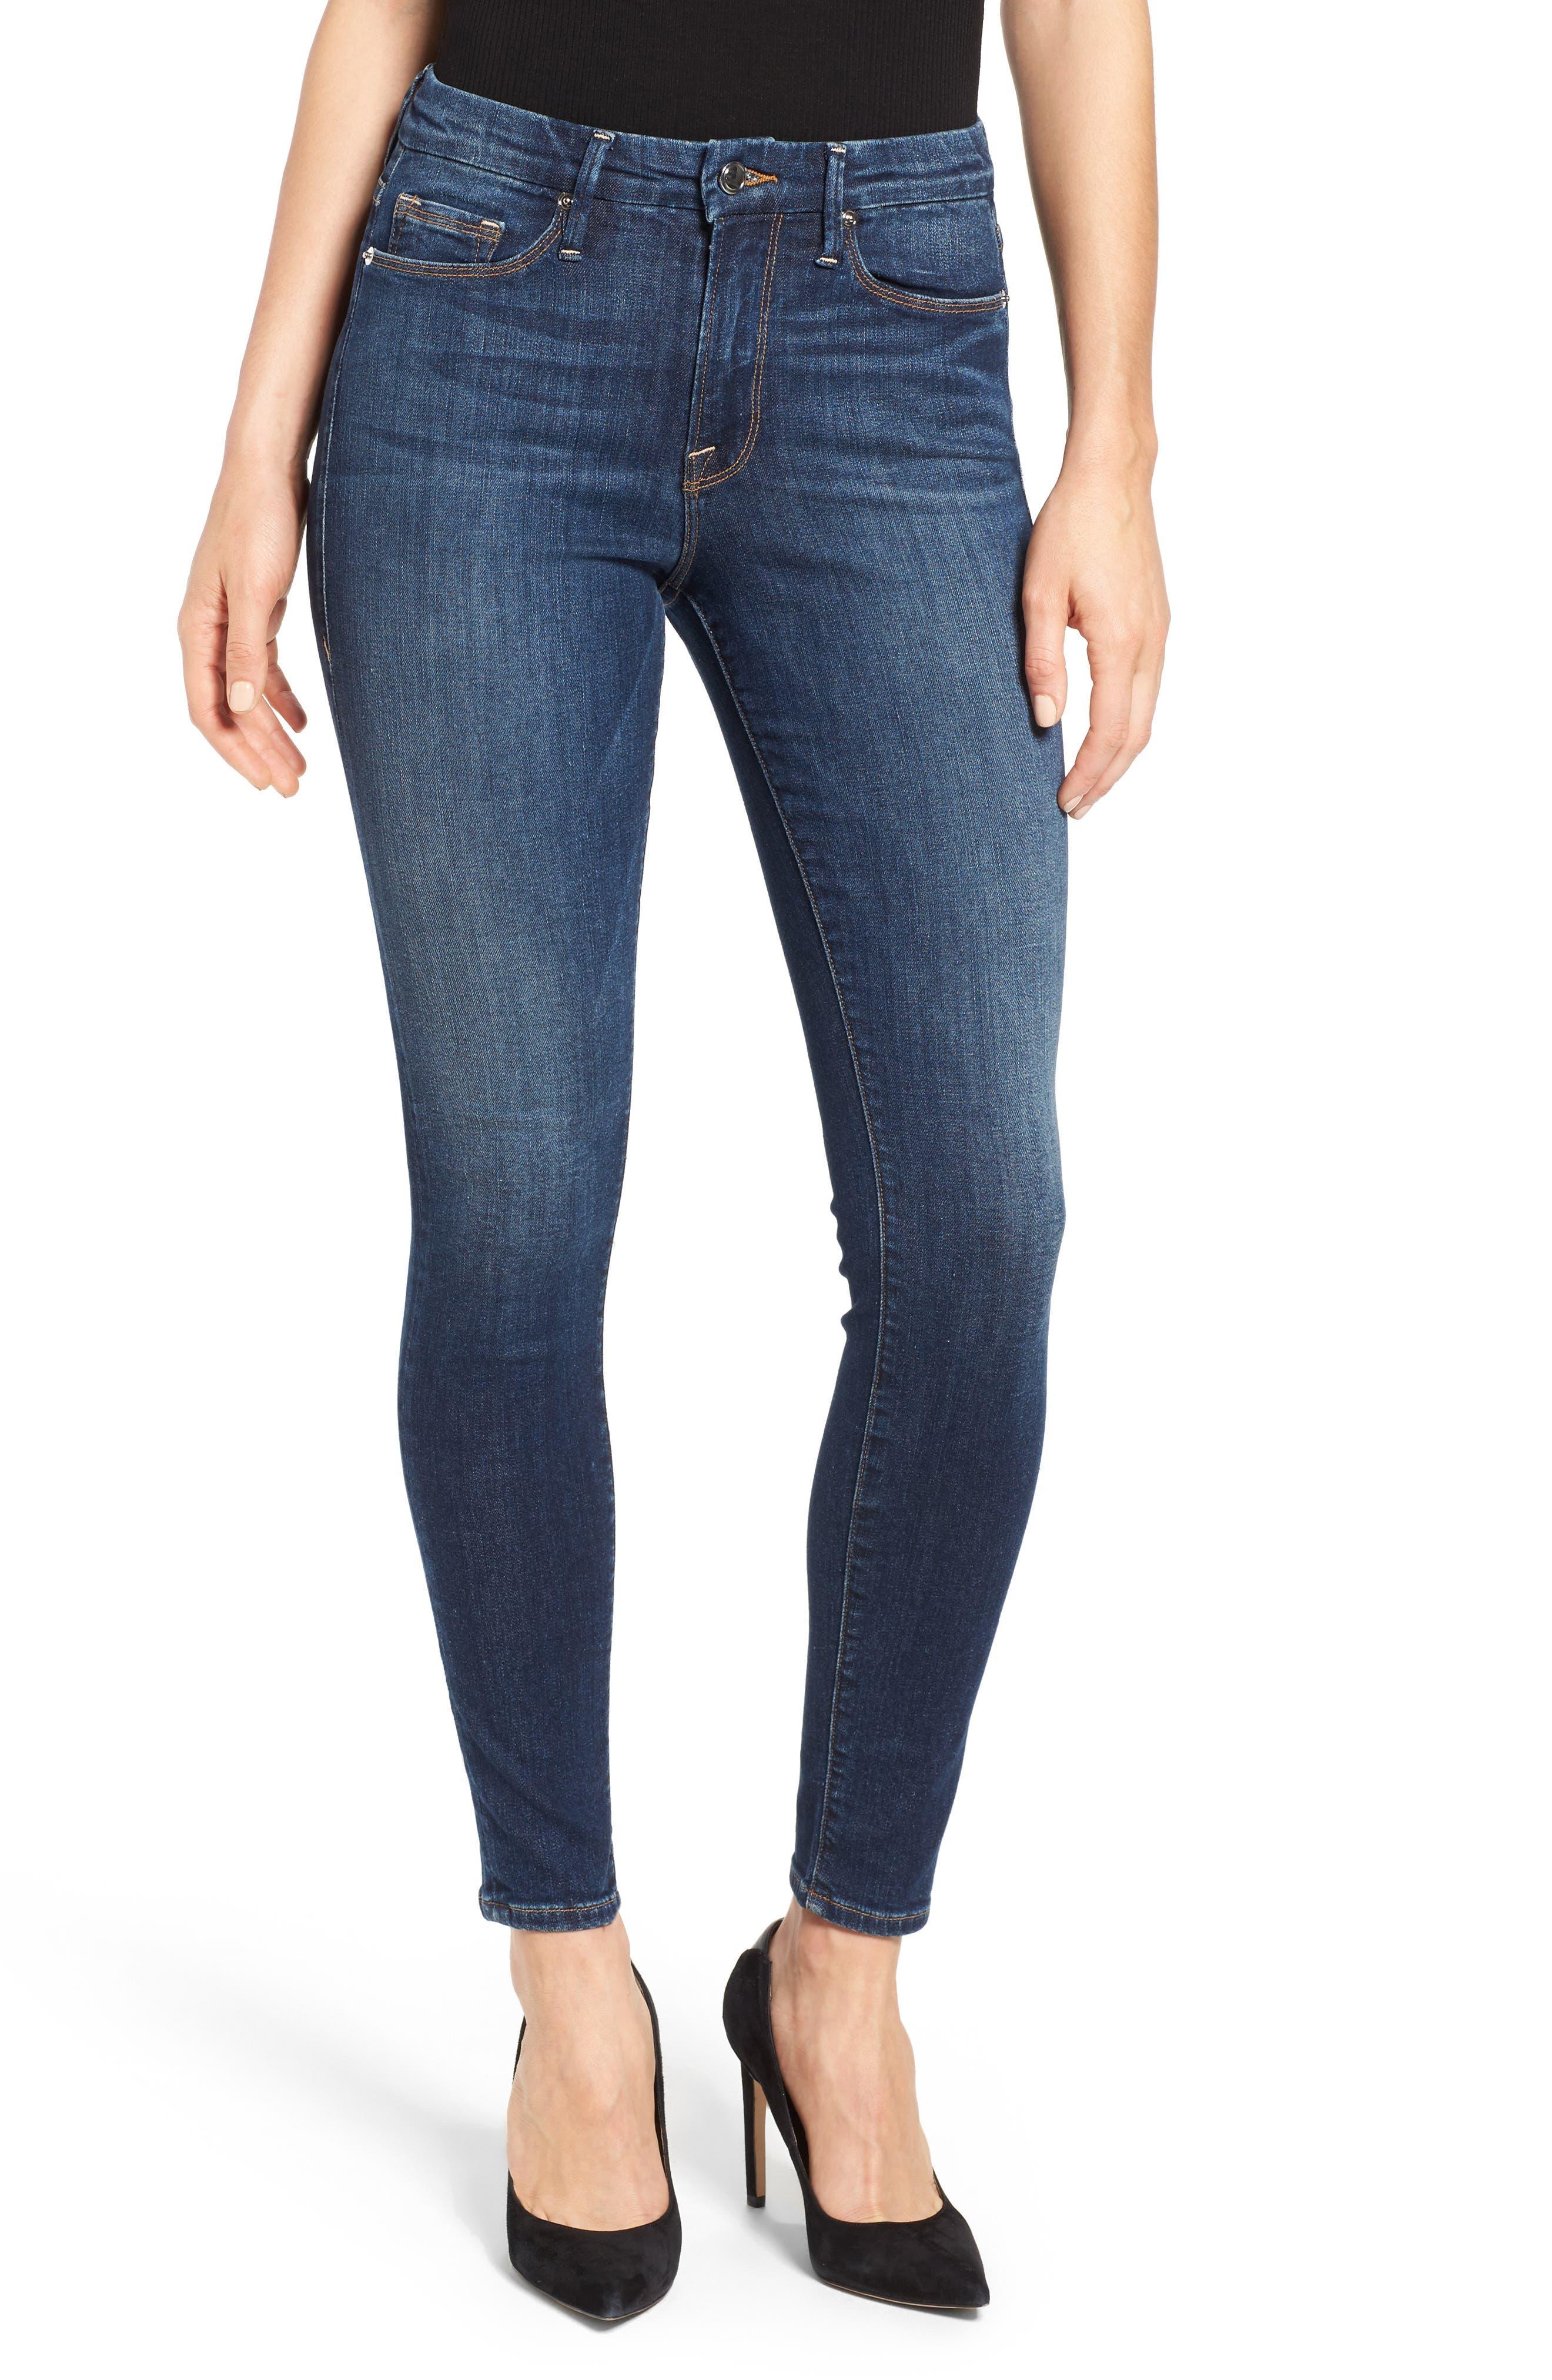 Plus Women's Good American Good Legs High Rise Skinny Jeans